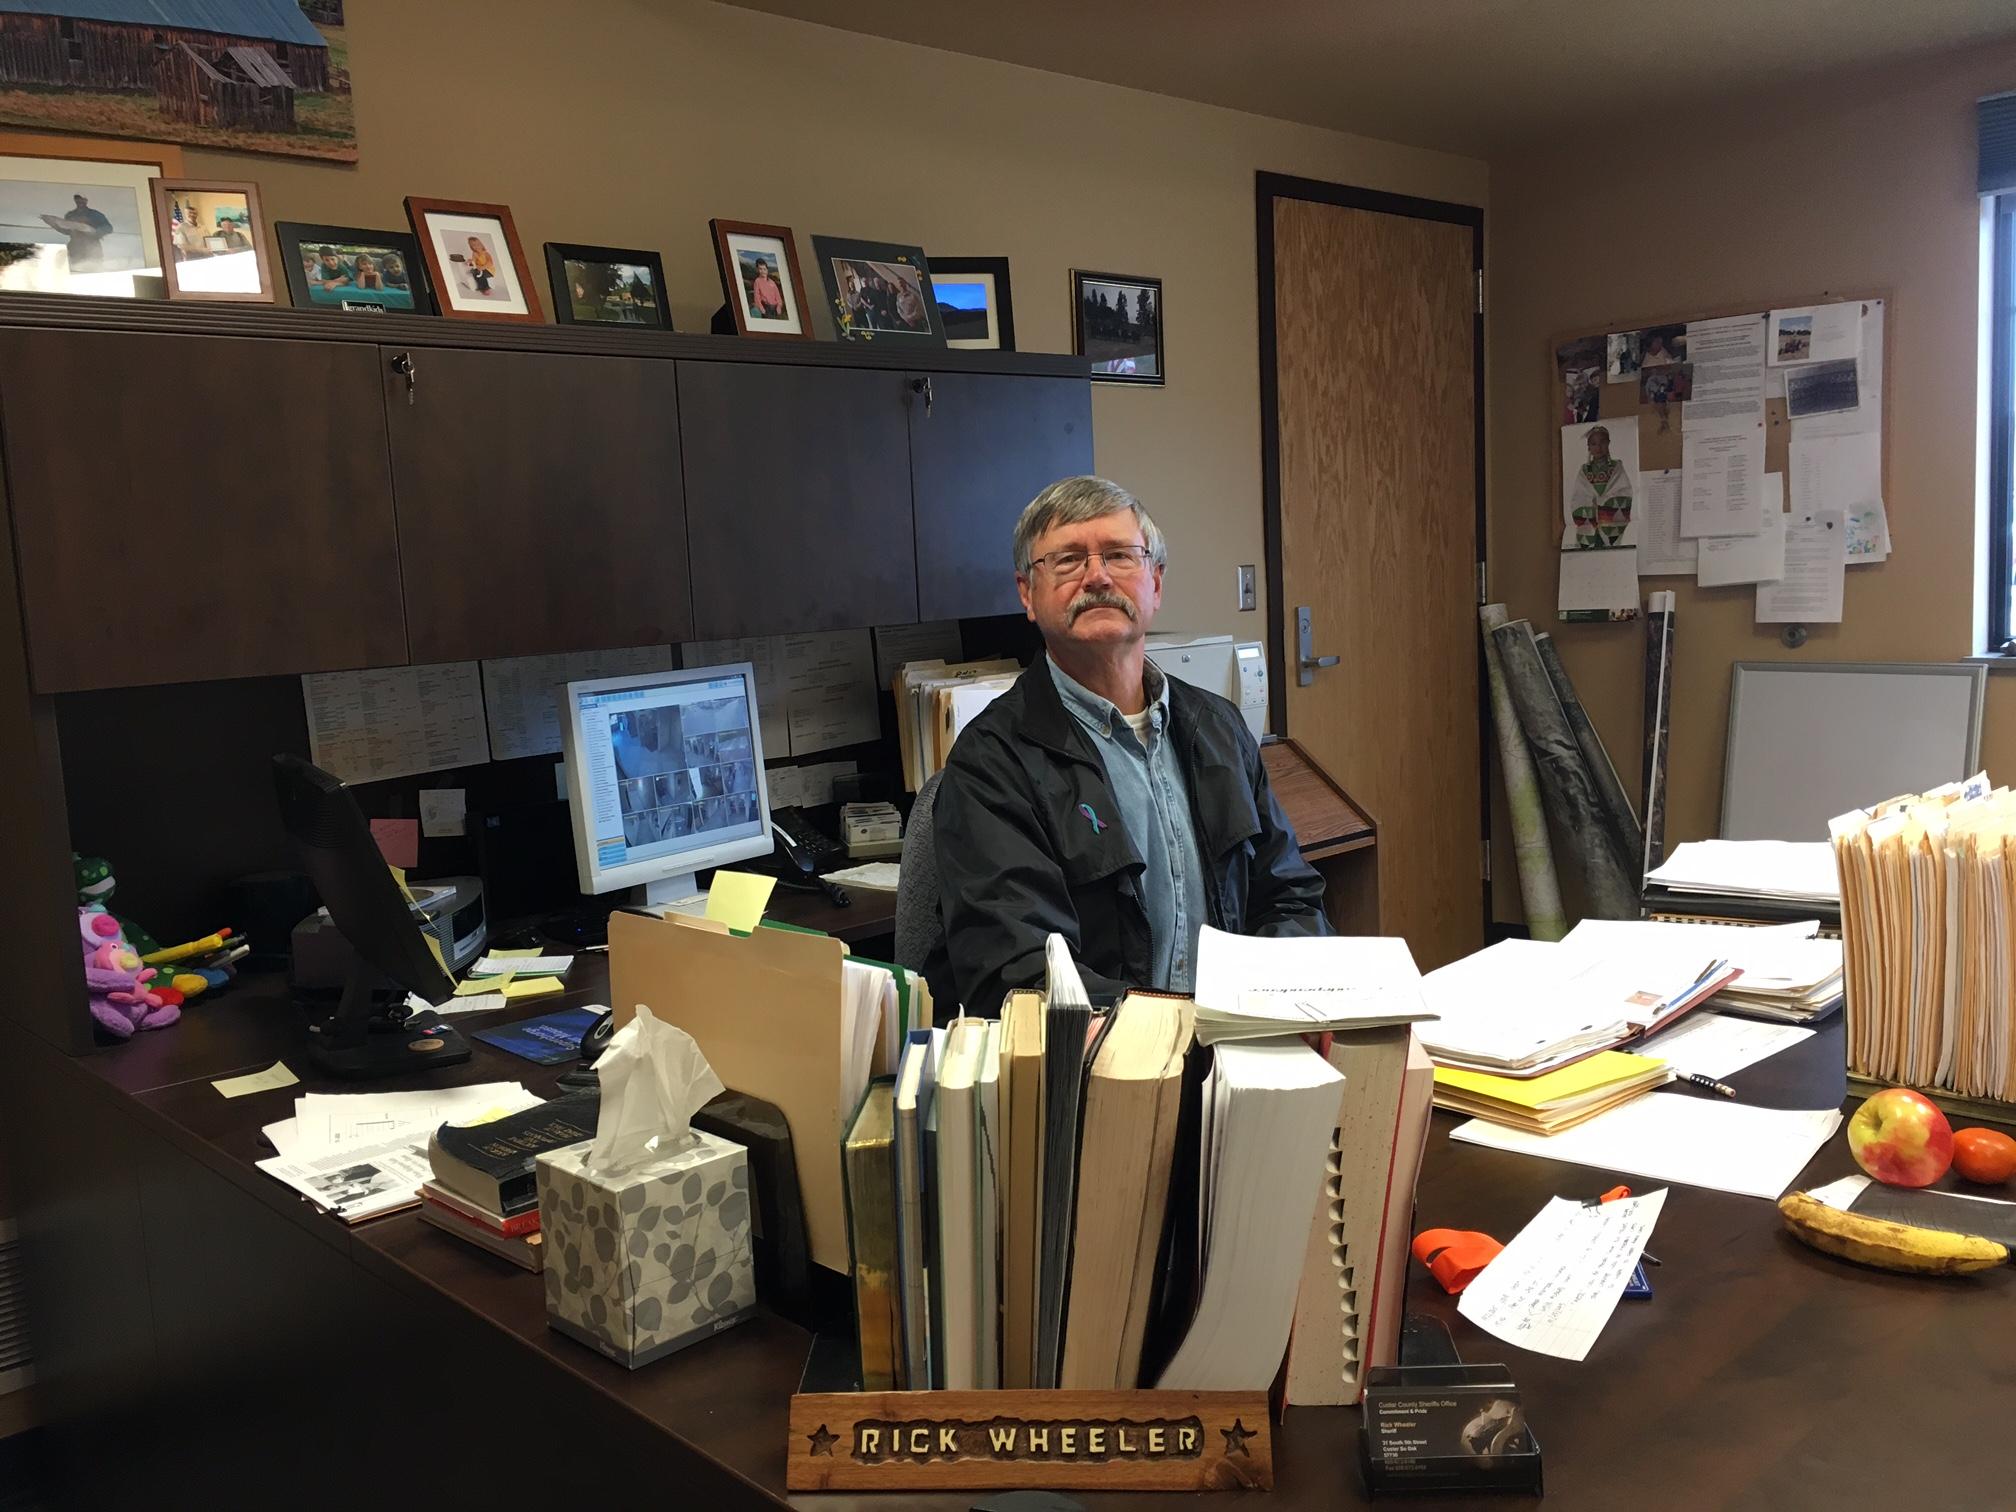 Sheriff's Office - Custer County, South Dakota